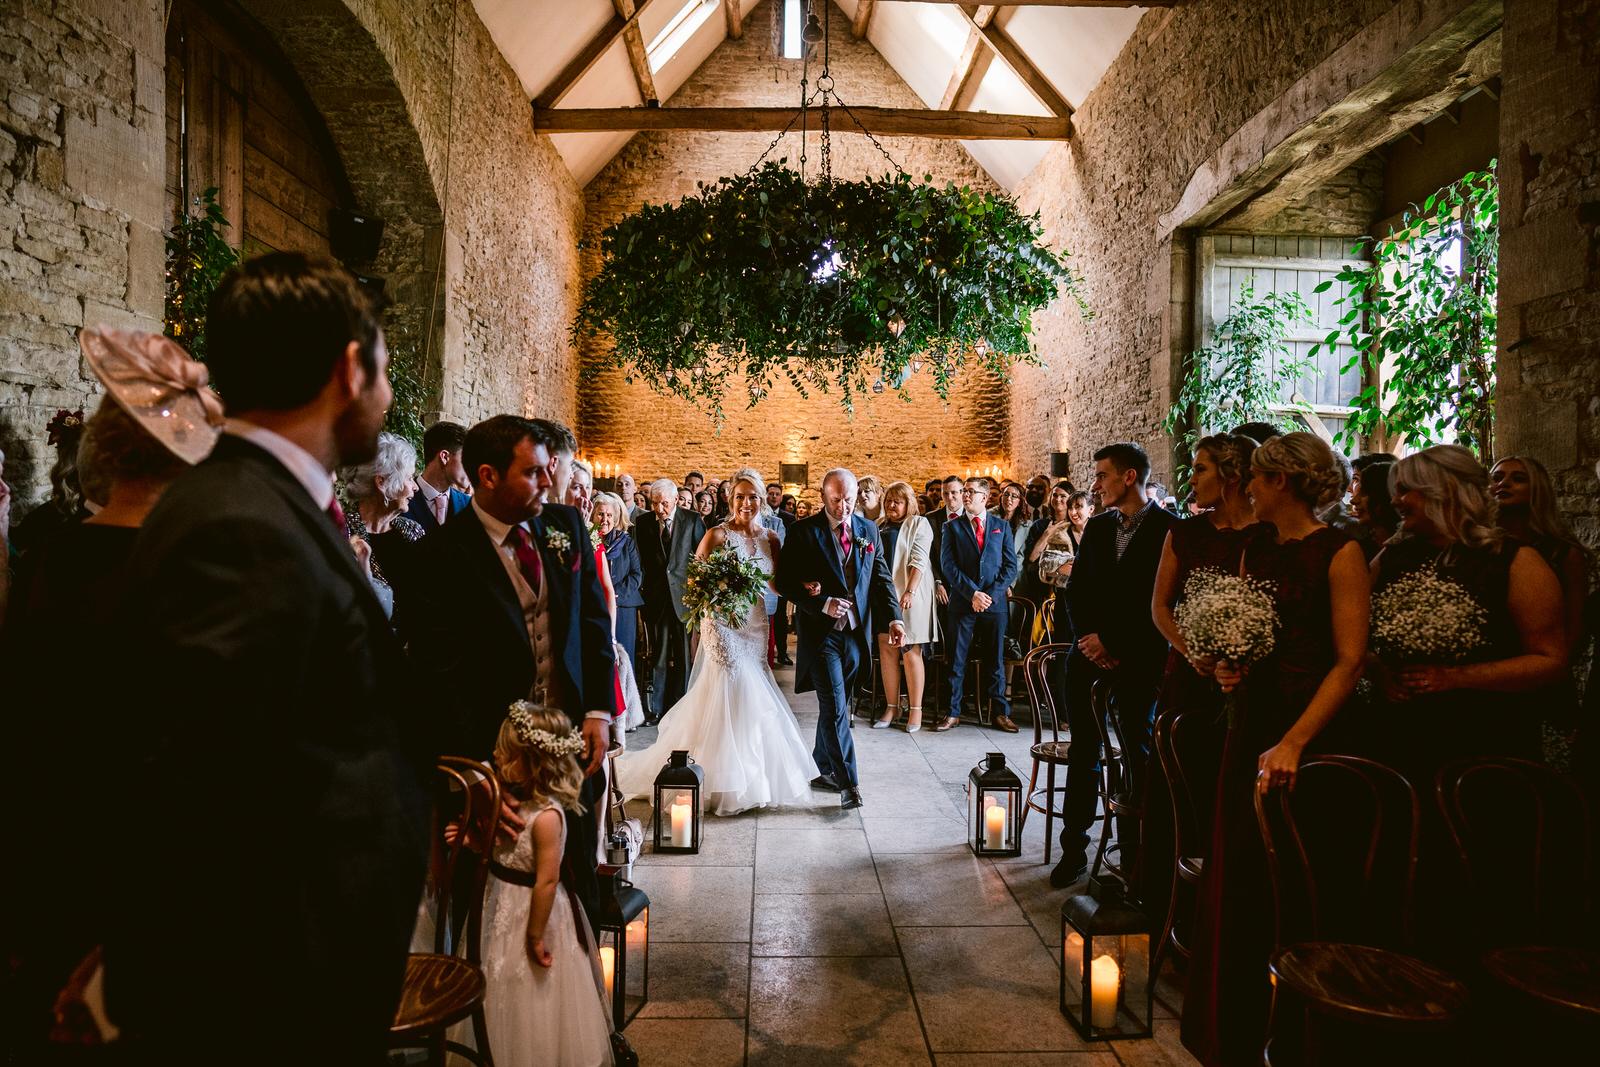 Stone Barn - Simon Brettell Photography - 21.12.18 - 383 - Kelly and Stevestone+barn+cotswold+wedding+venue.jpg